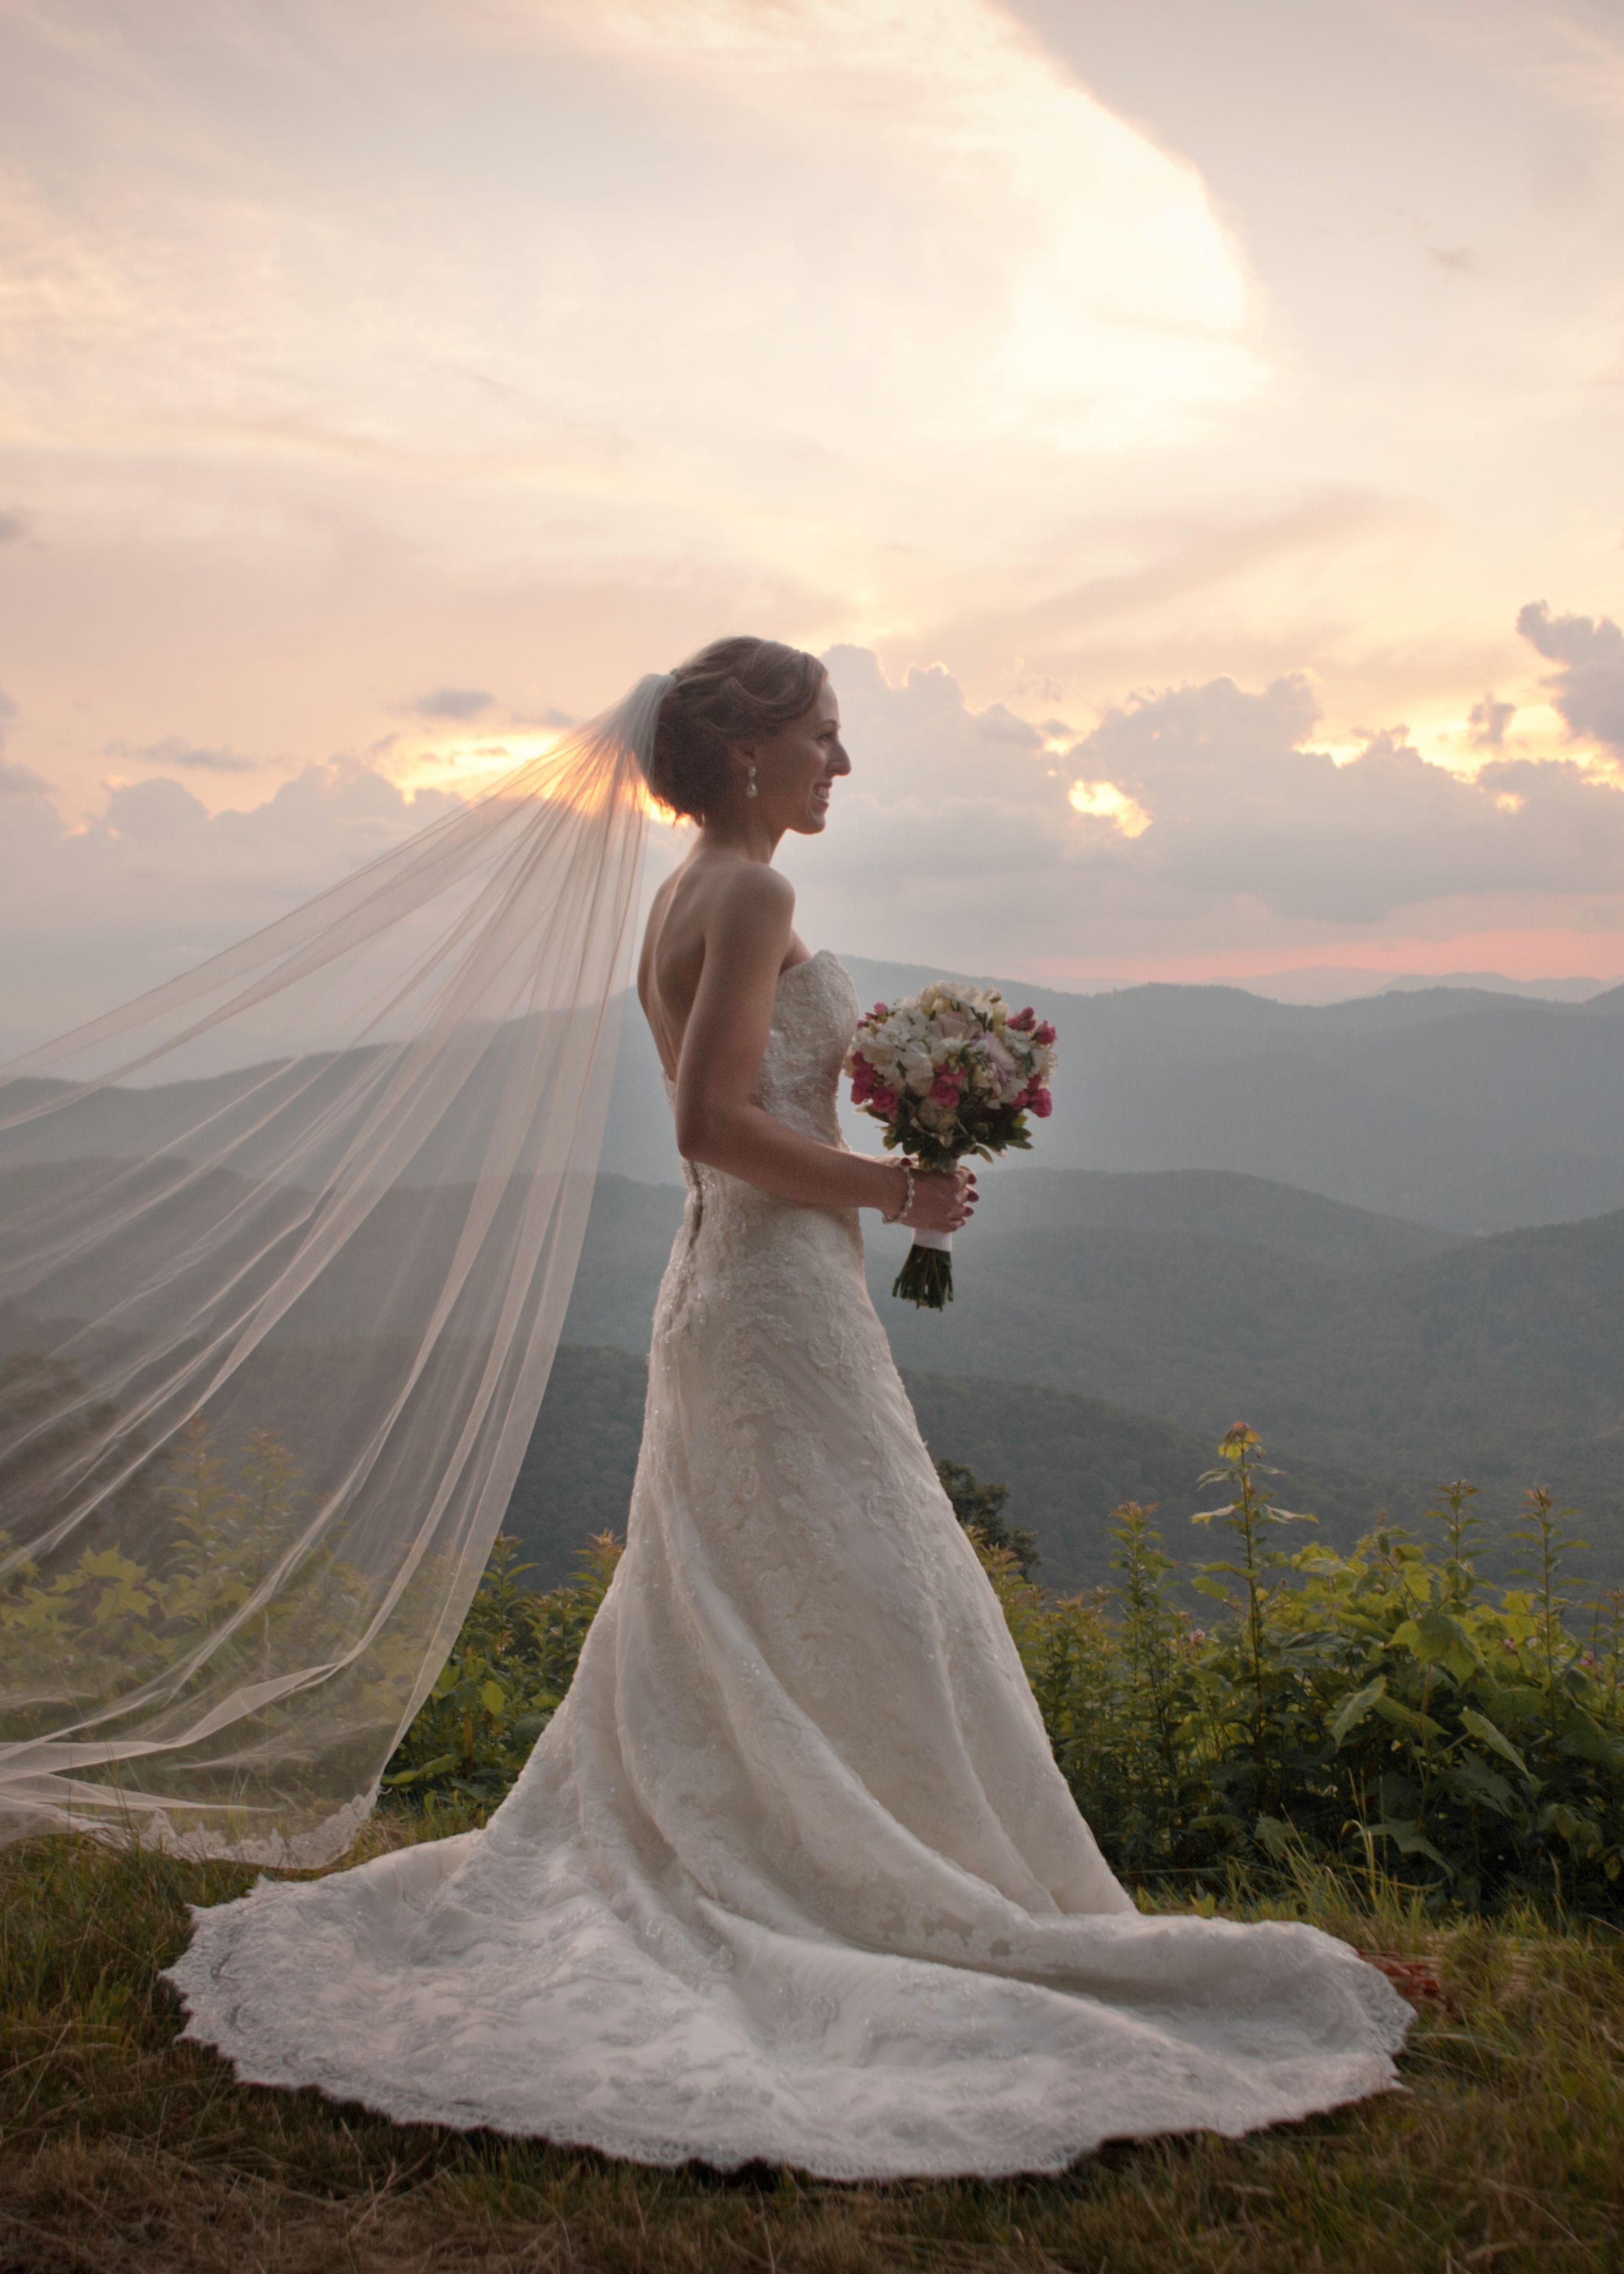 Pin by Sawyer Family Farmstead on Wedding Photography   Mountain wedding venues, Nc mountain ...